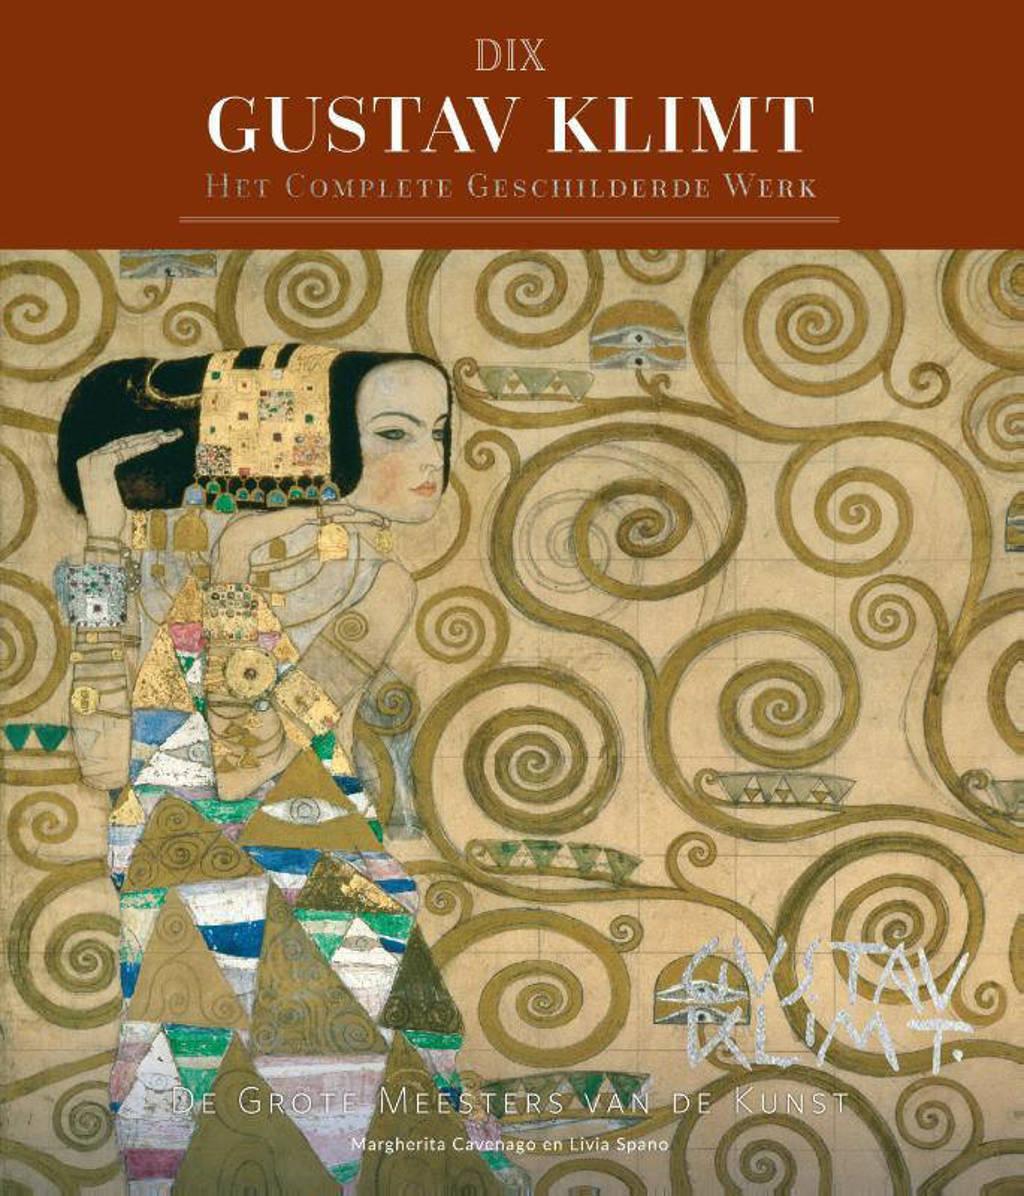 DIX: Gustav Klimt